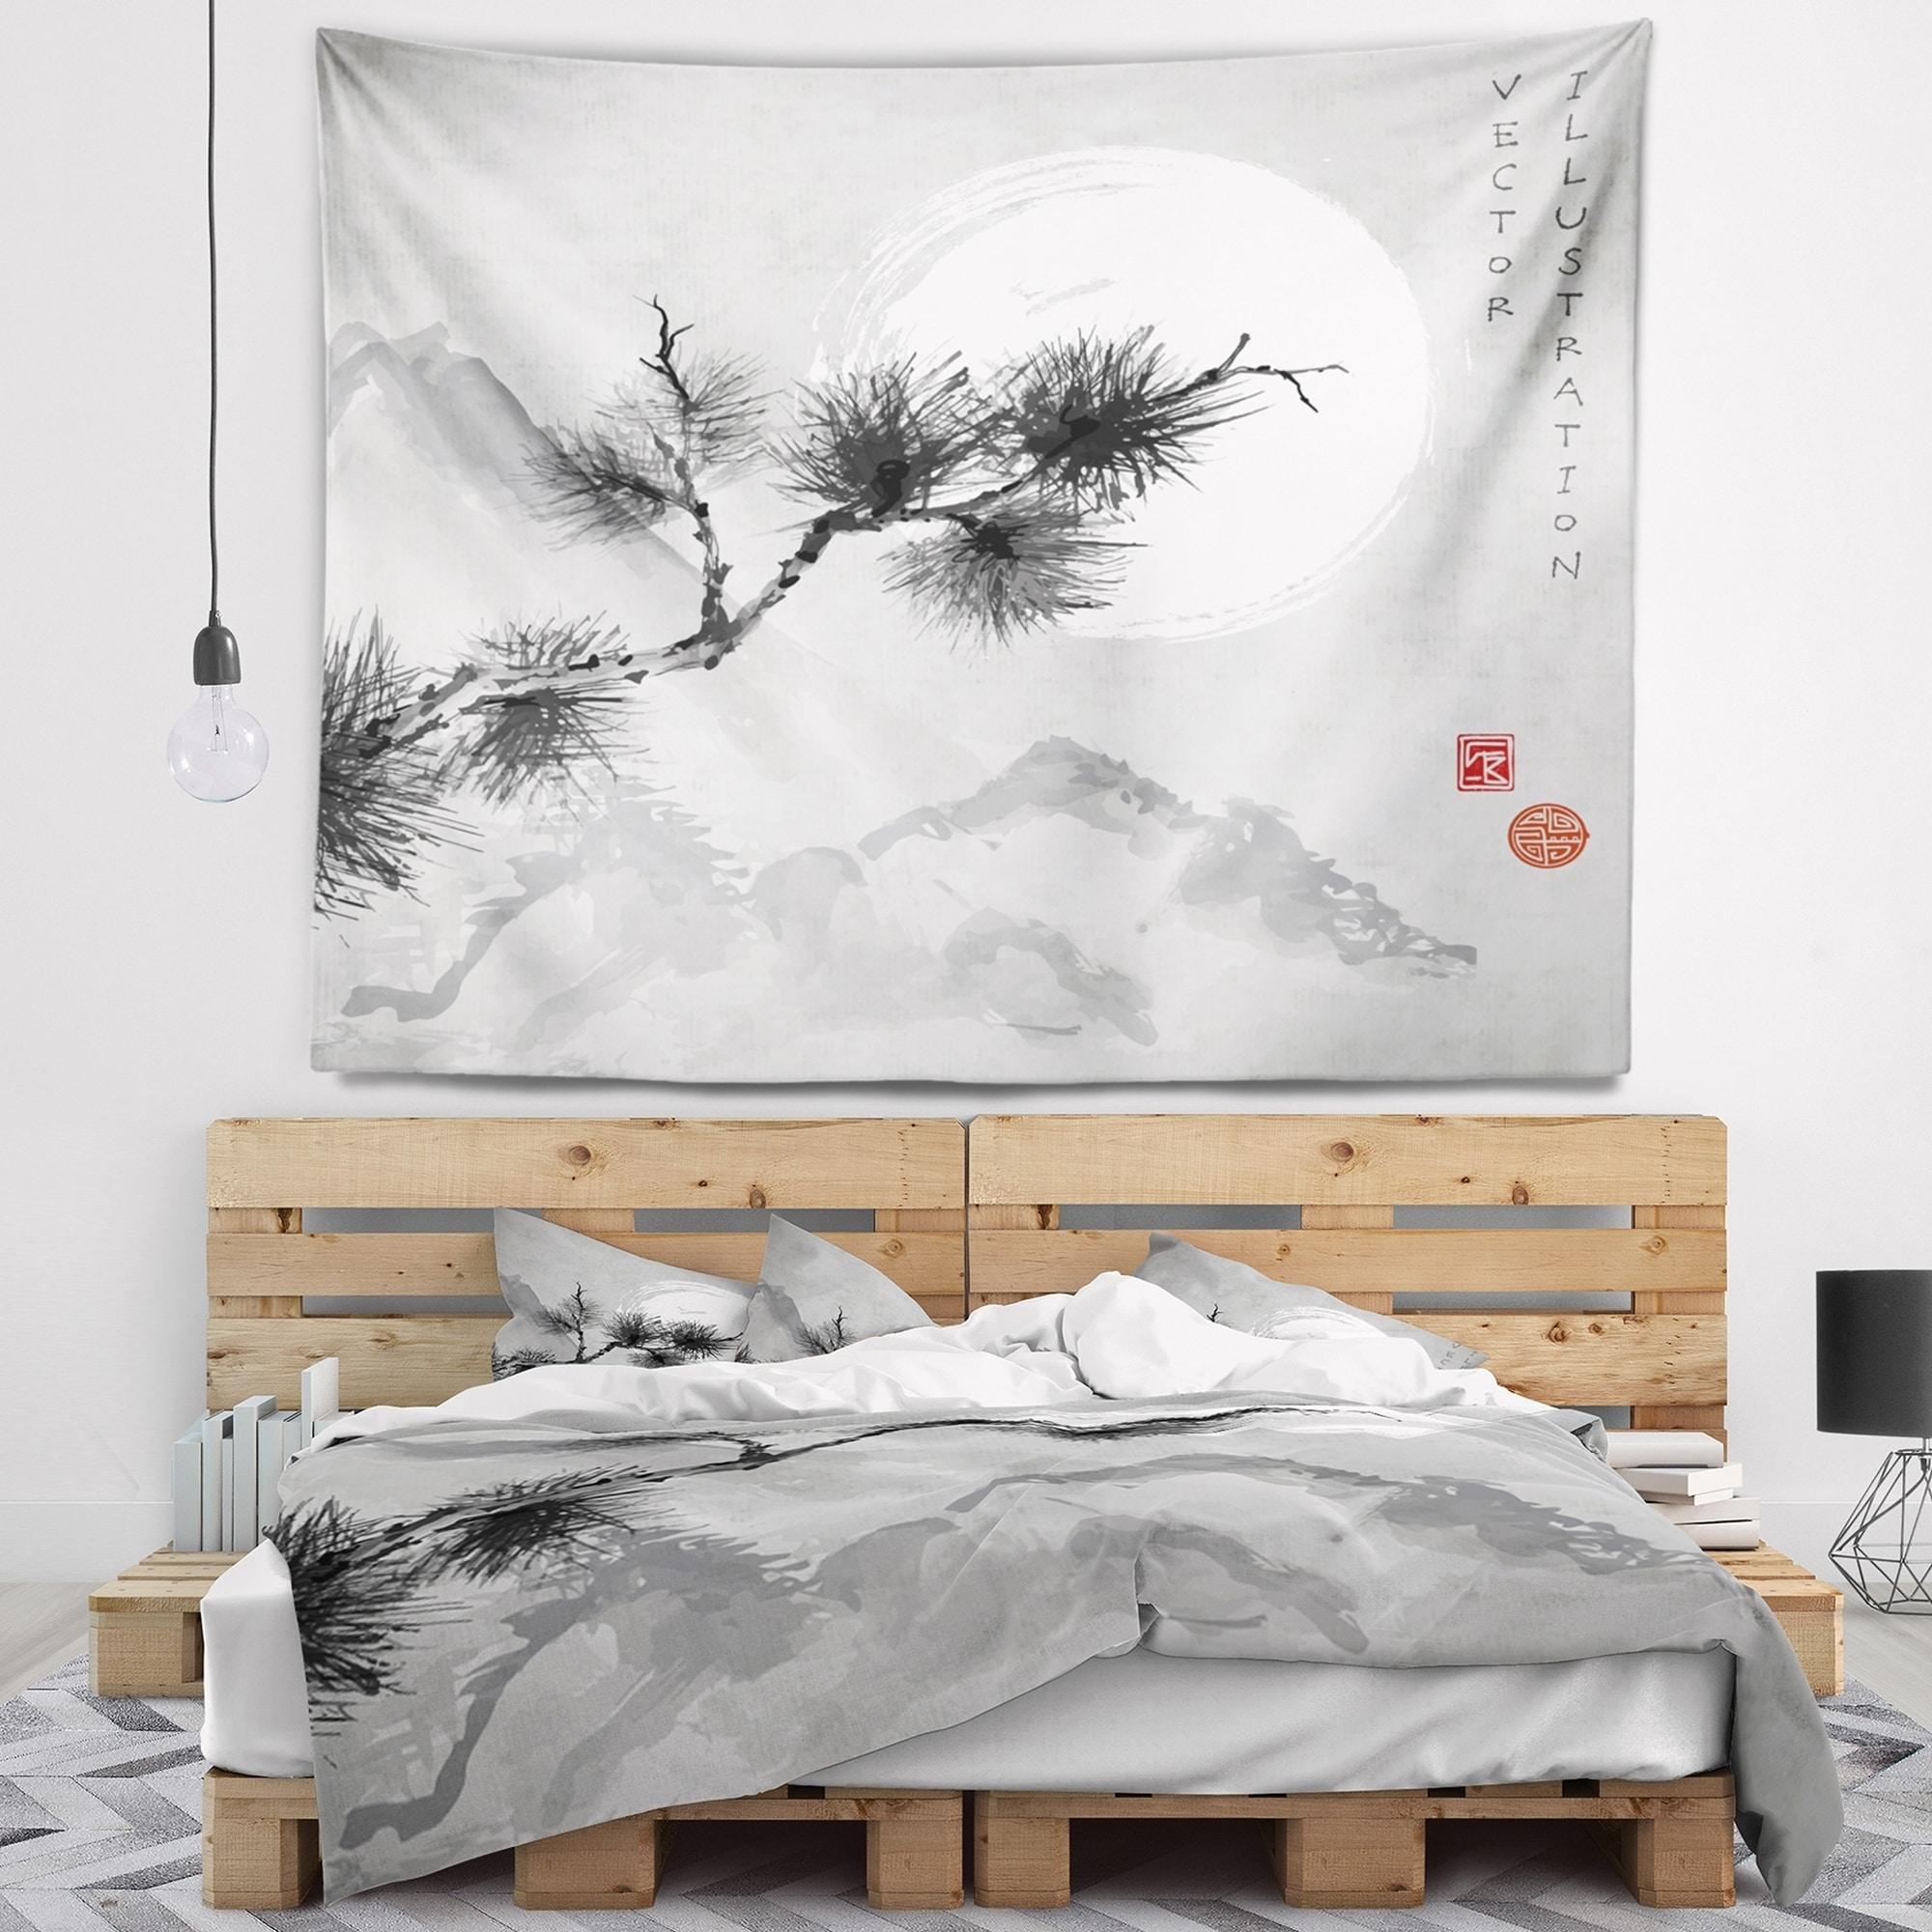 Designart \'Pine Tree Branch\' Japanese Wall Tapestry | eBay